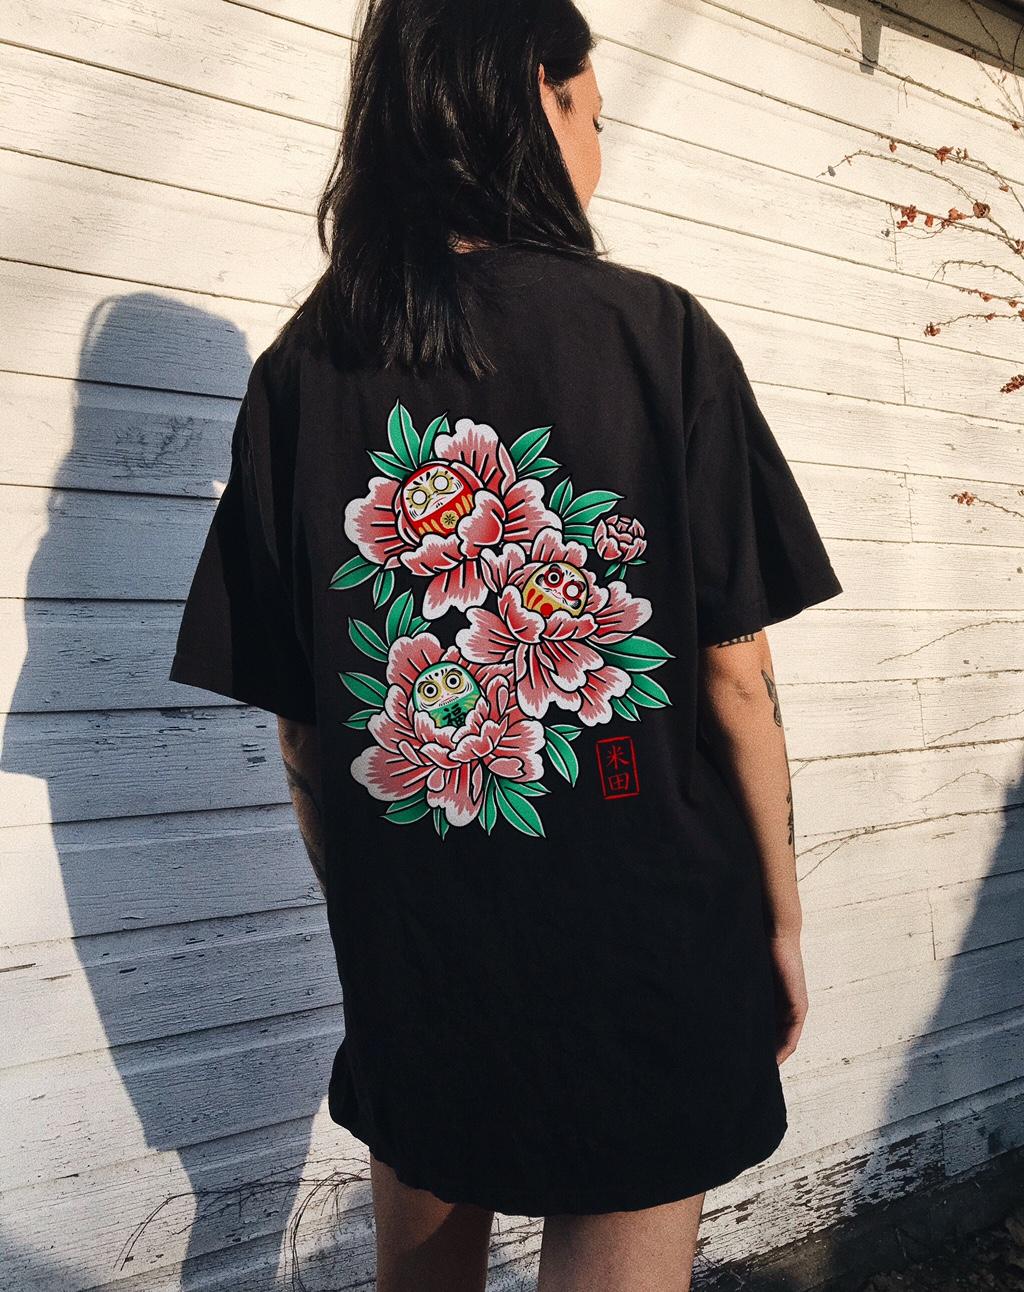 Girl wearing black floral t-shirt